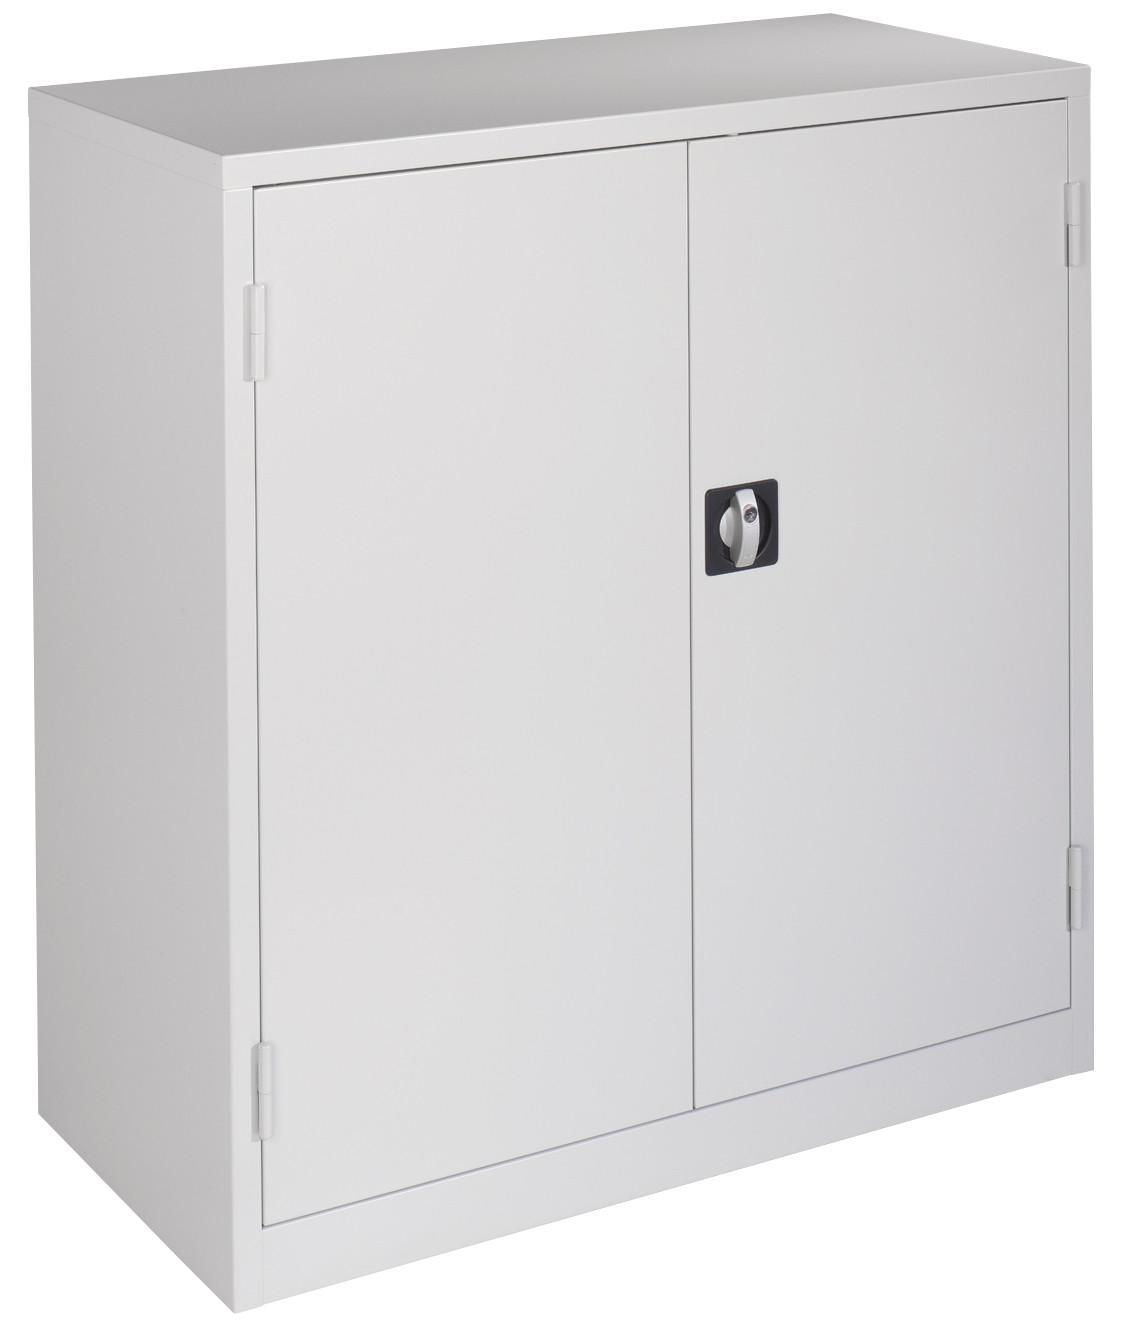 Flex werkplaatskast 106 x 100 x 45 cm